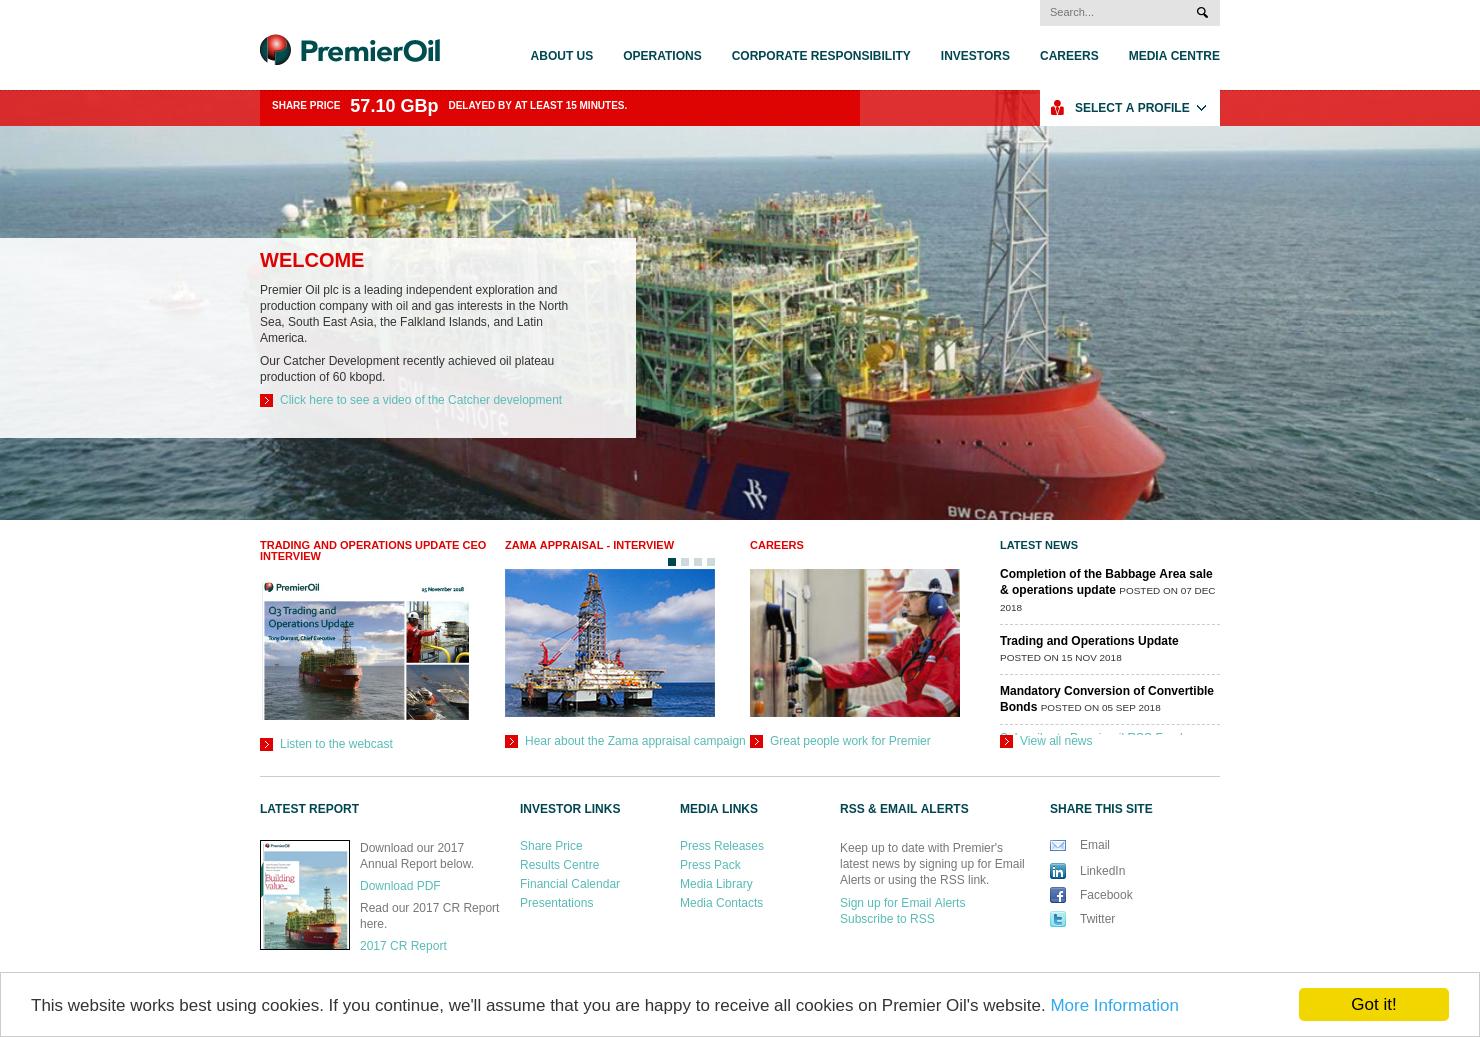 Premier Oil Home Page